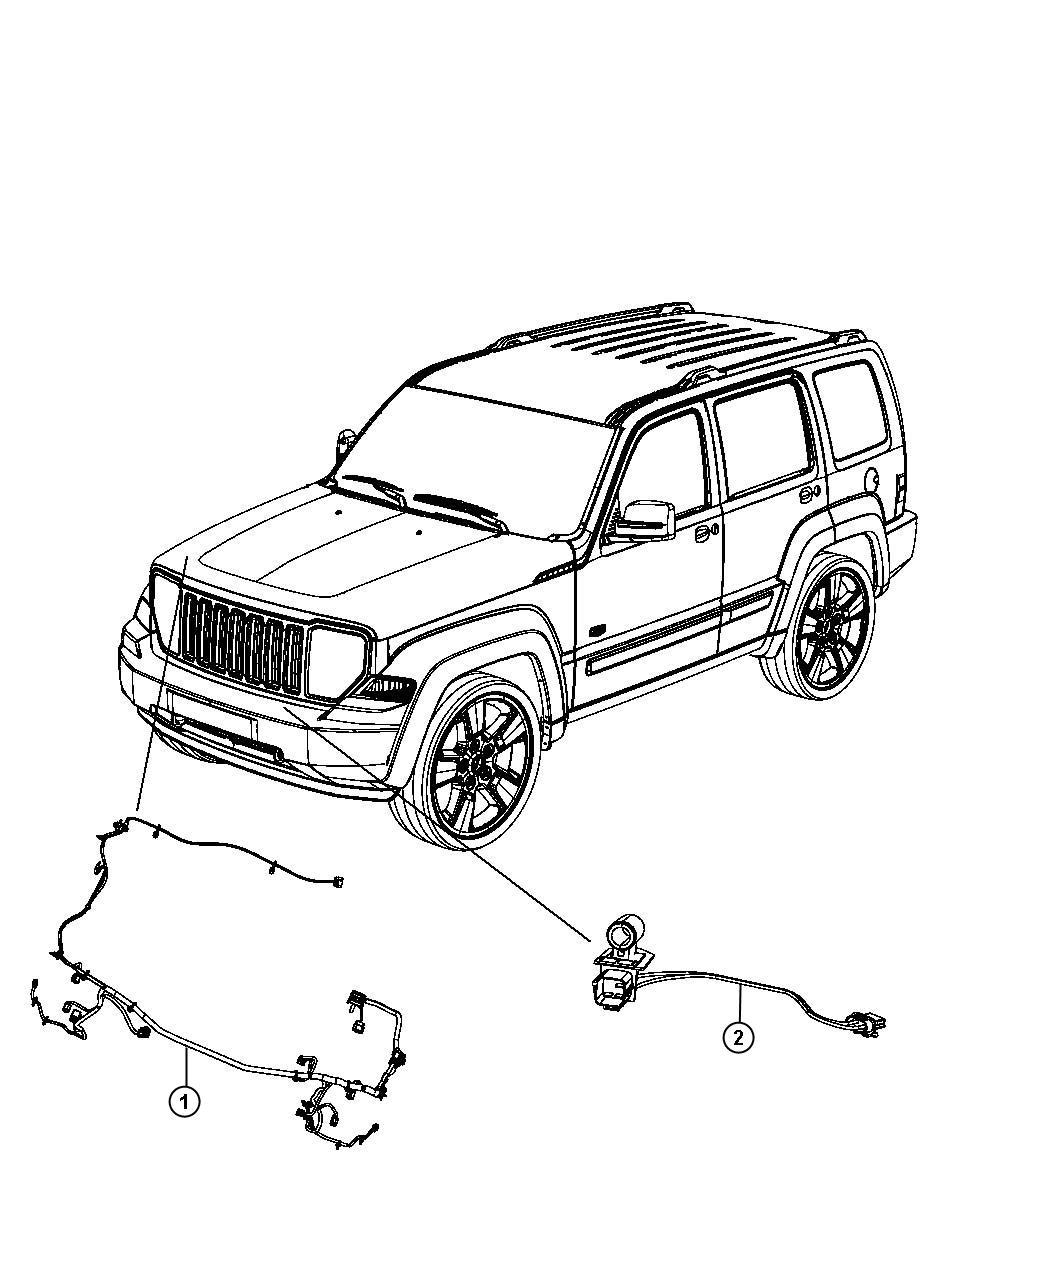 2012 Jeep Liberty Wiring Headlamp to Dash